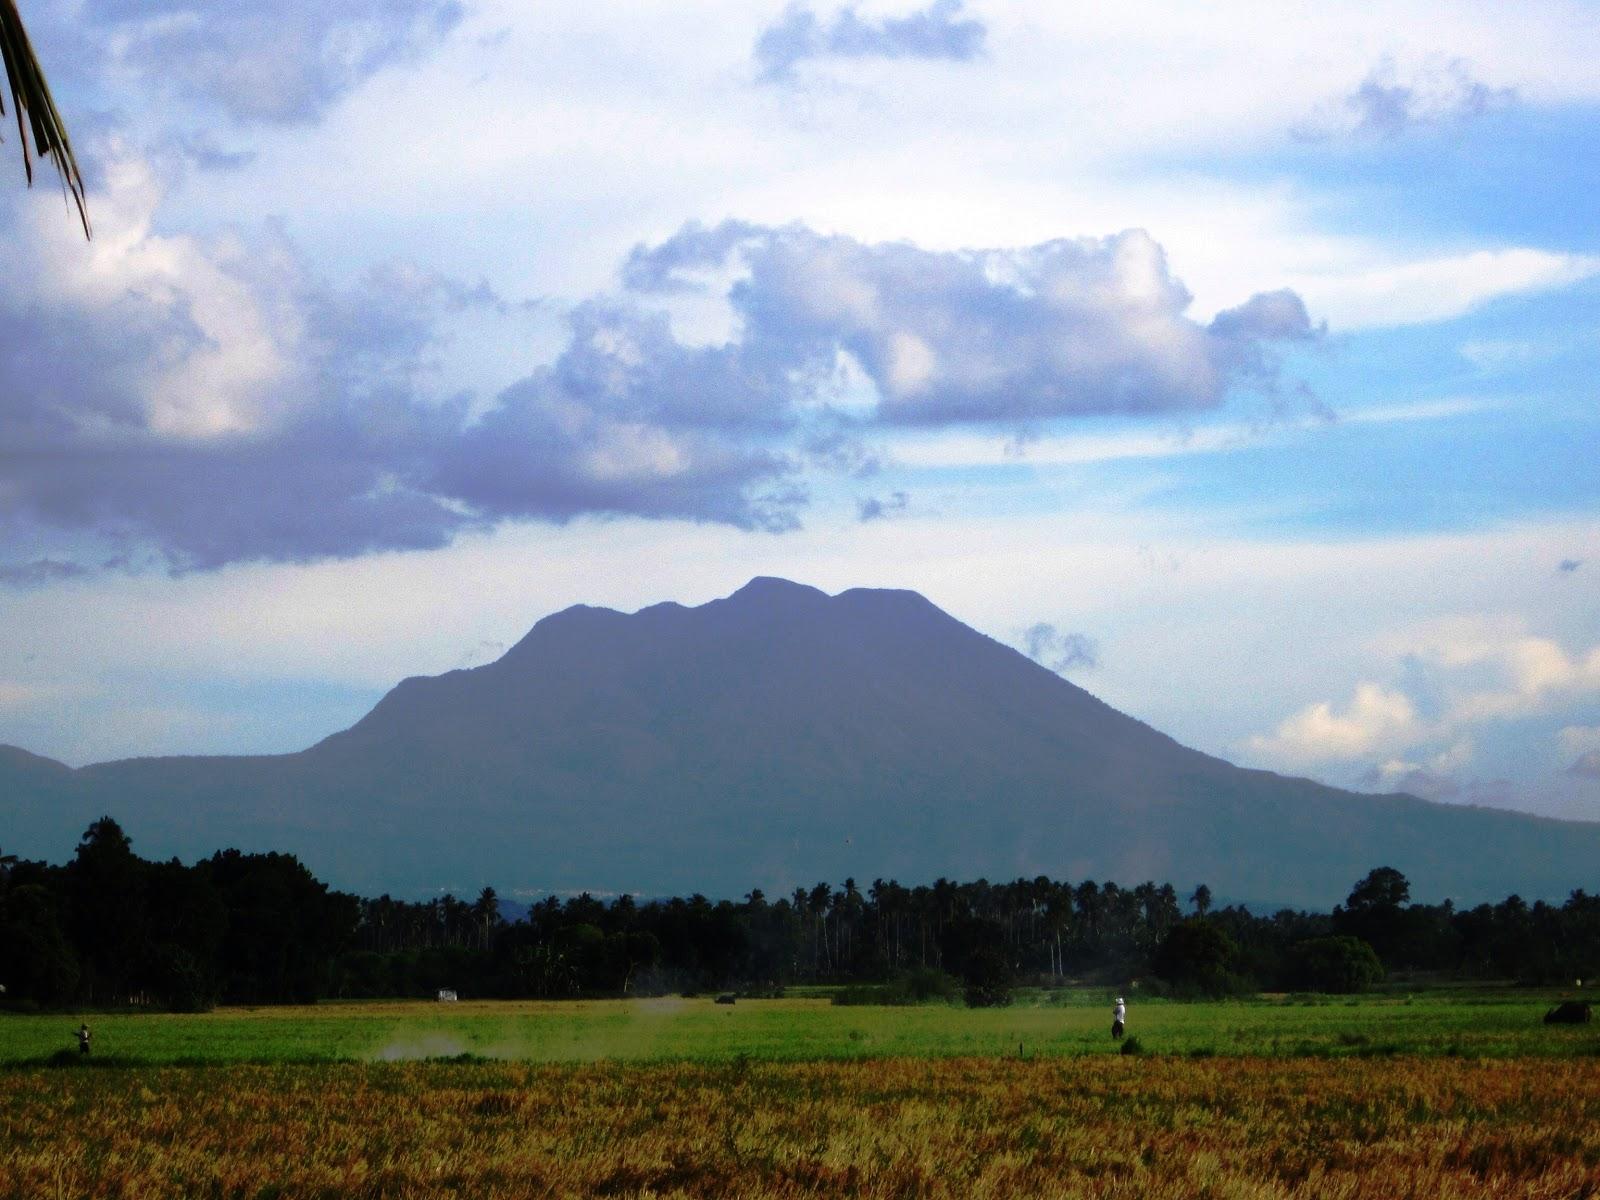 Dolores (Quezon) Philippines  city photos gallery : Mt. Cristobal Dolores Quezon, CLIMBING MT CRISTOBAL, CRISTOBAL THE ...